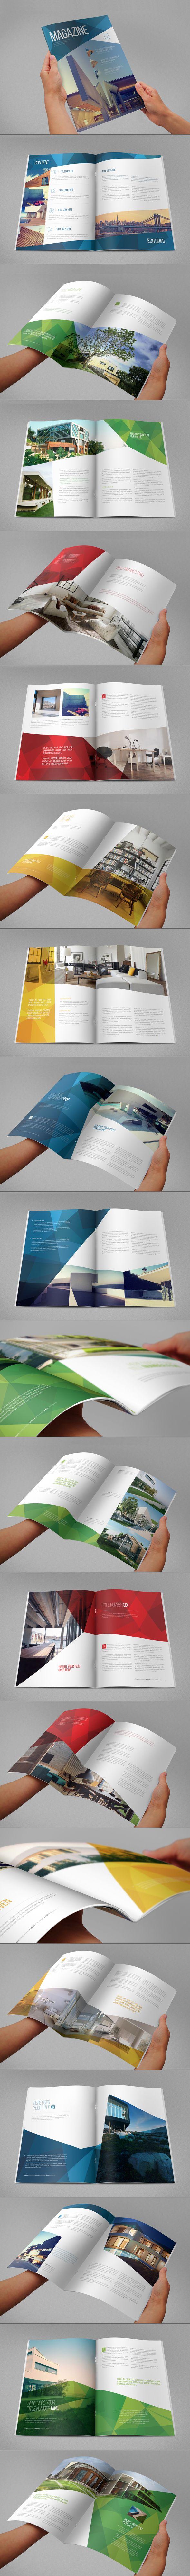 Modern Architecture Magazine. Download here: http://graphicriver.net/item/modern-architecture-magazine/7717553?ref=abradesign #magazine #design